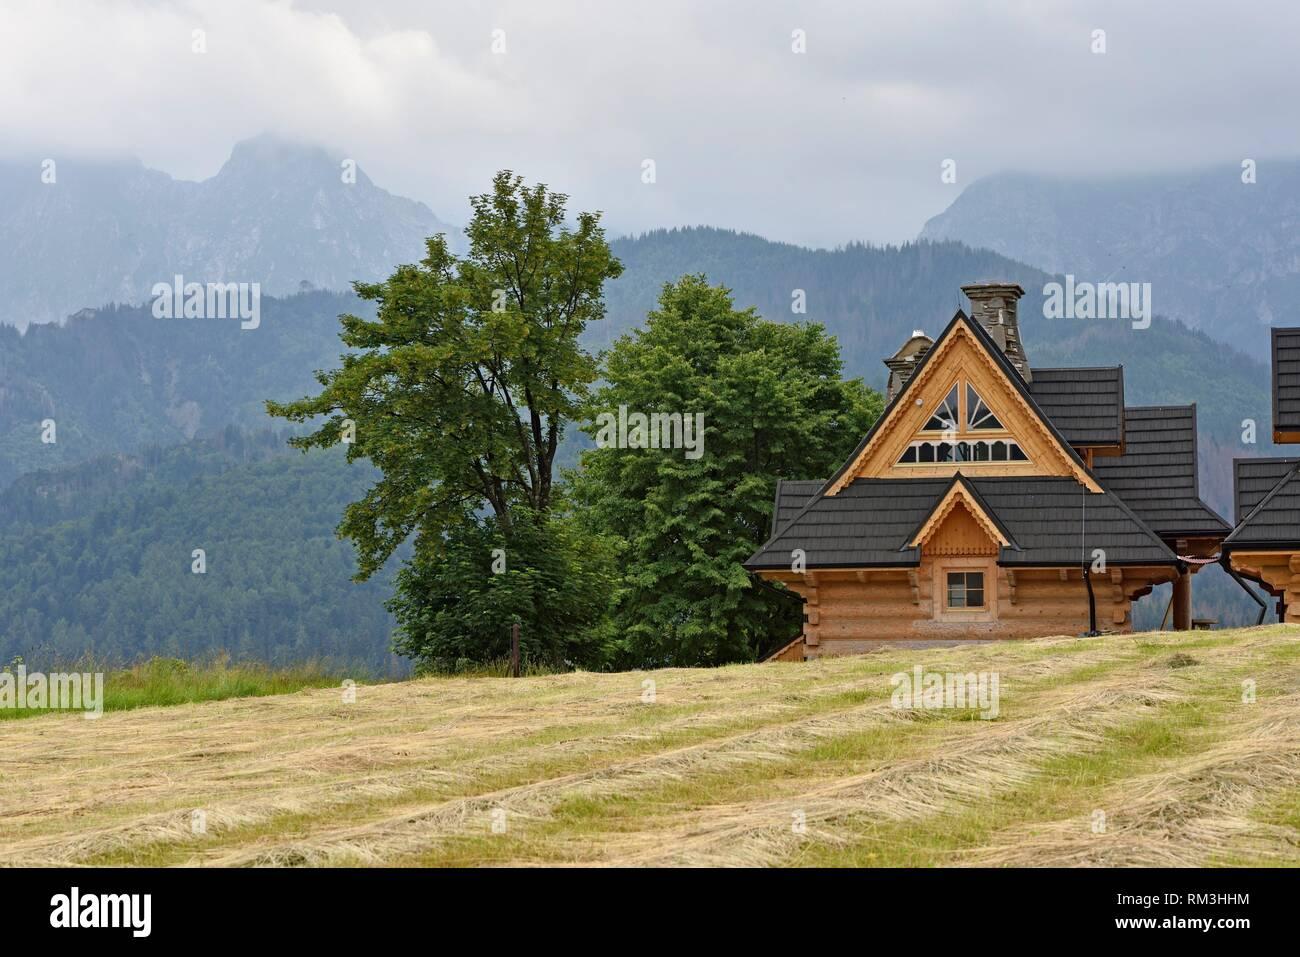 Maison En Bois Stockfotos & Maison En Bois Bilder - Alamy